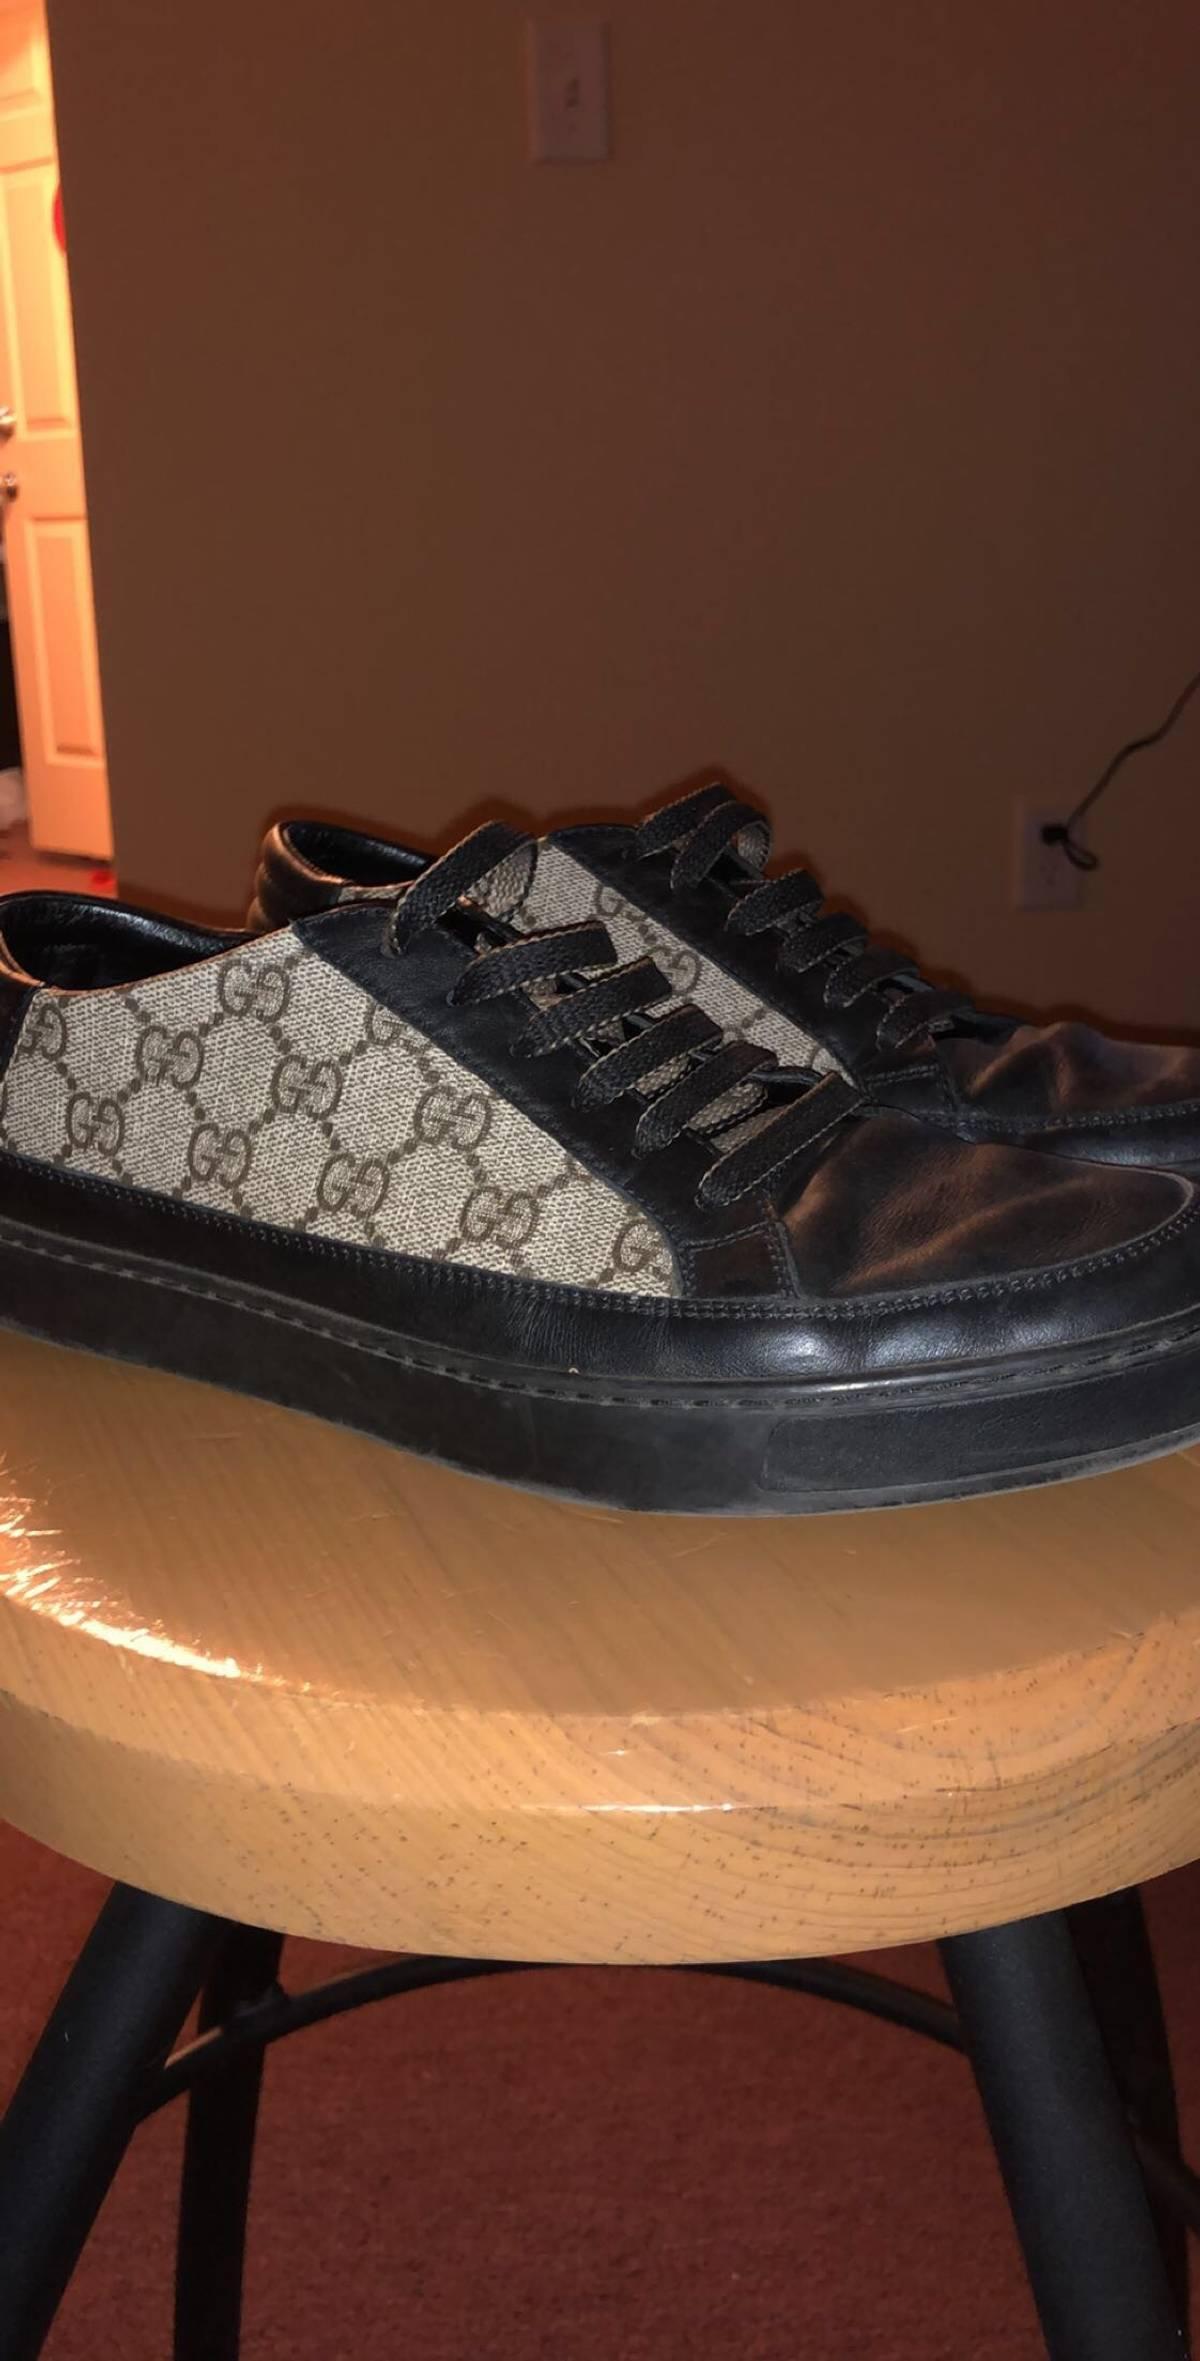 55eec1dde92f85 Gucci Gucci Mens Common Gg Low Top Sneaker | Grailed